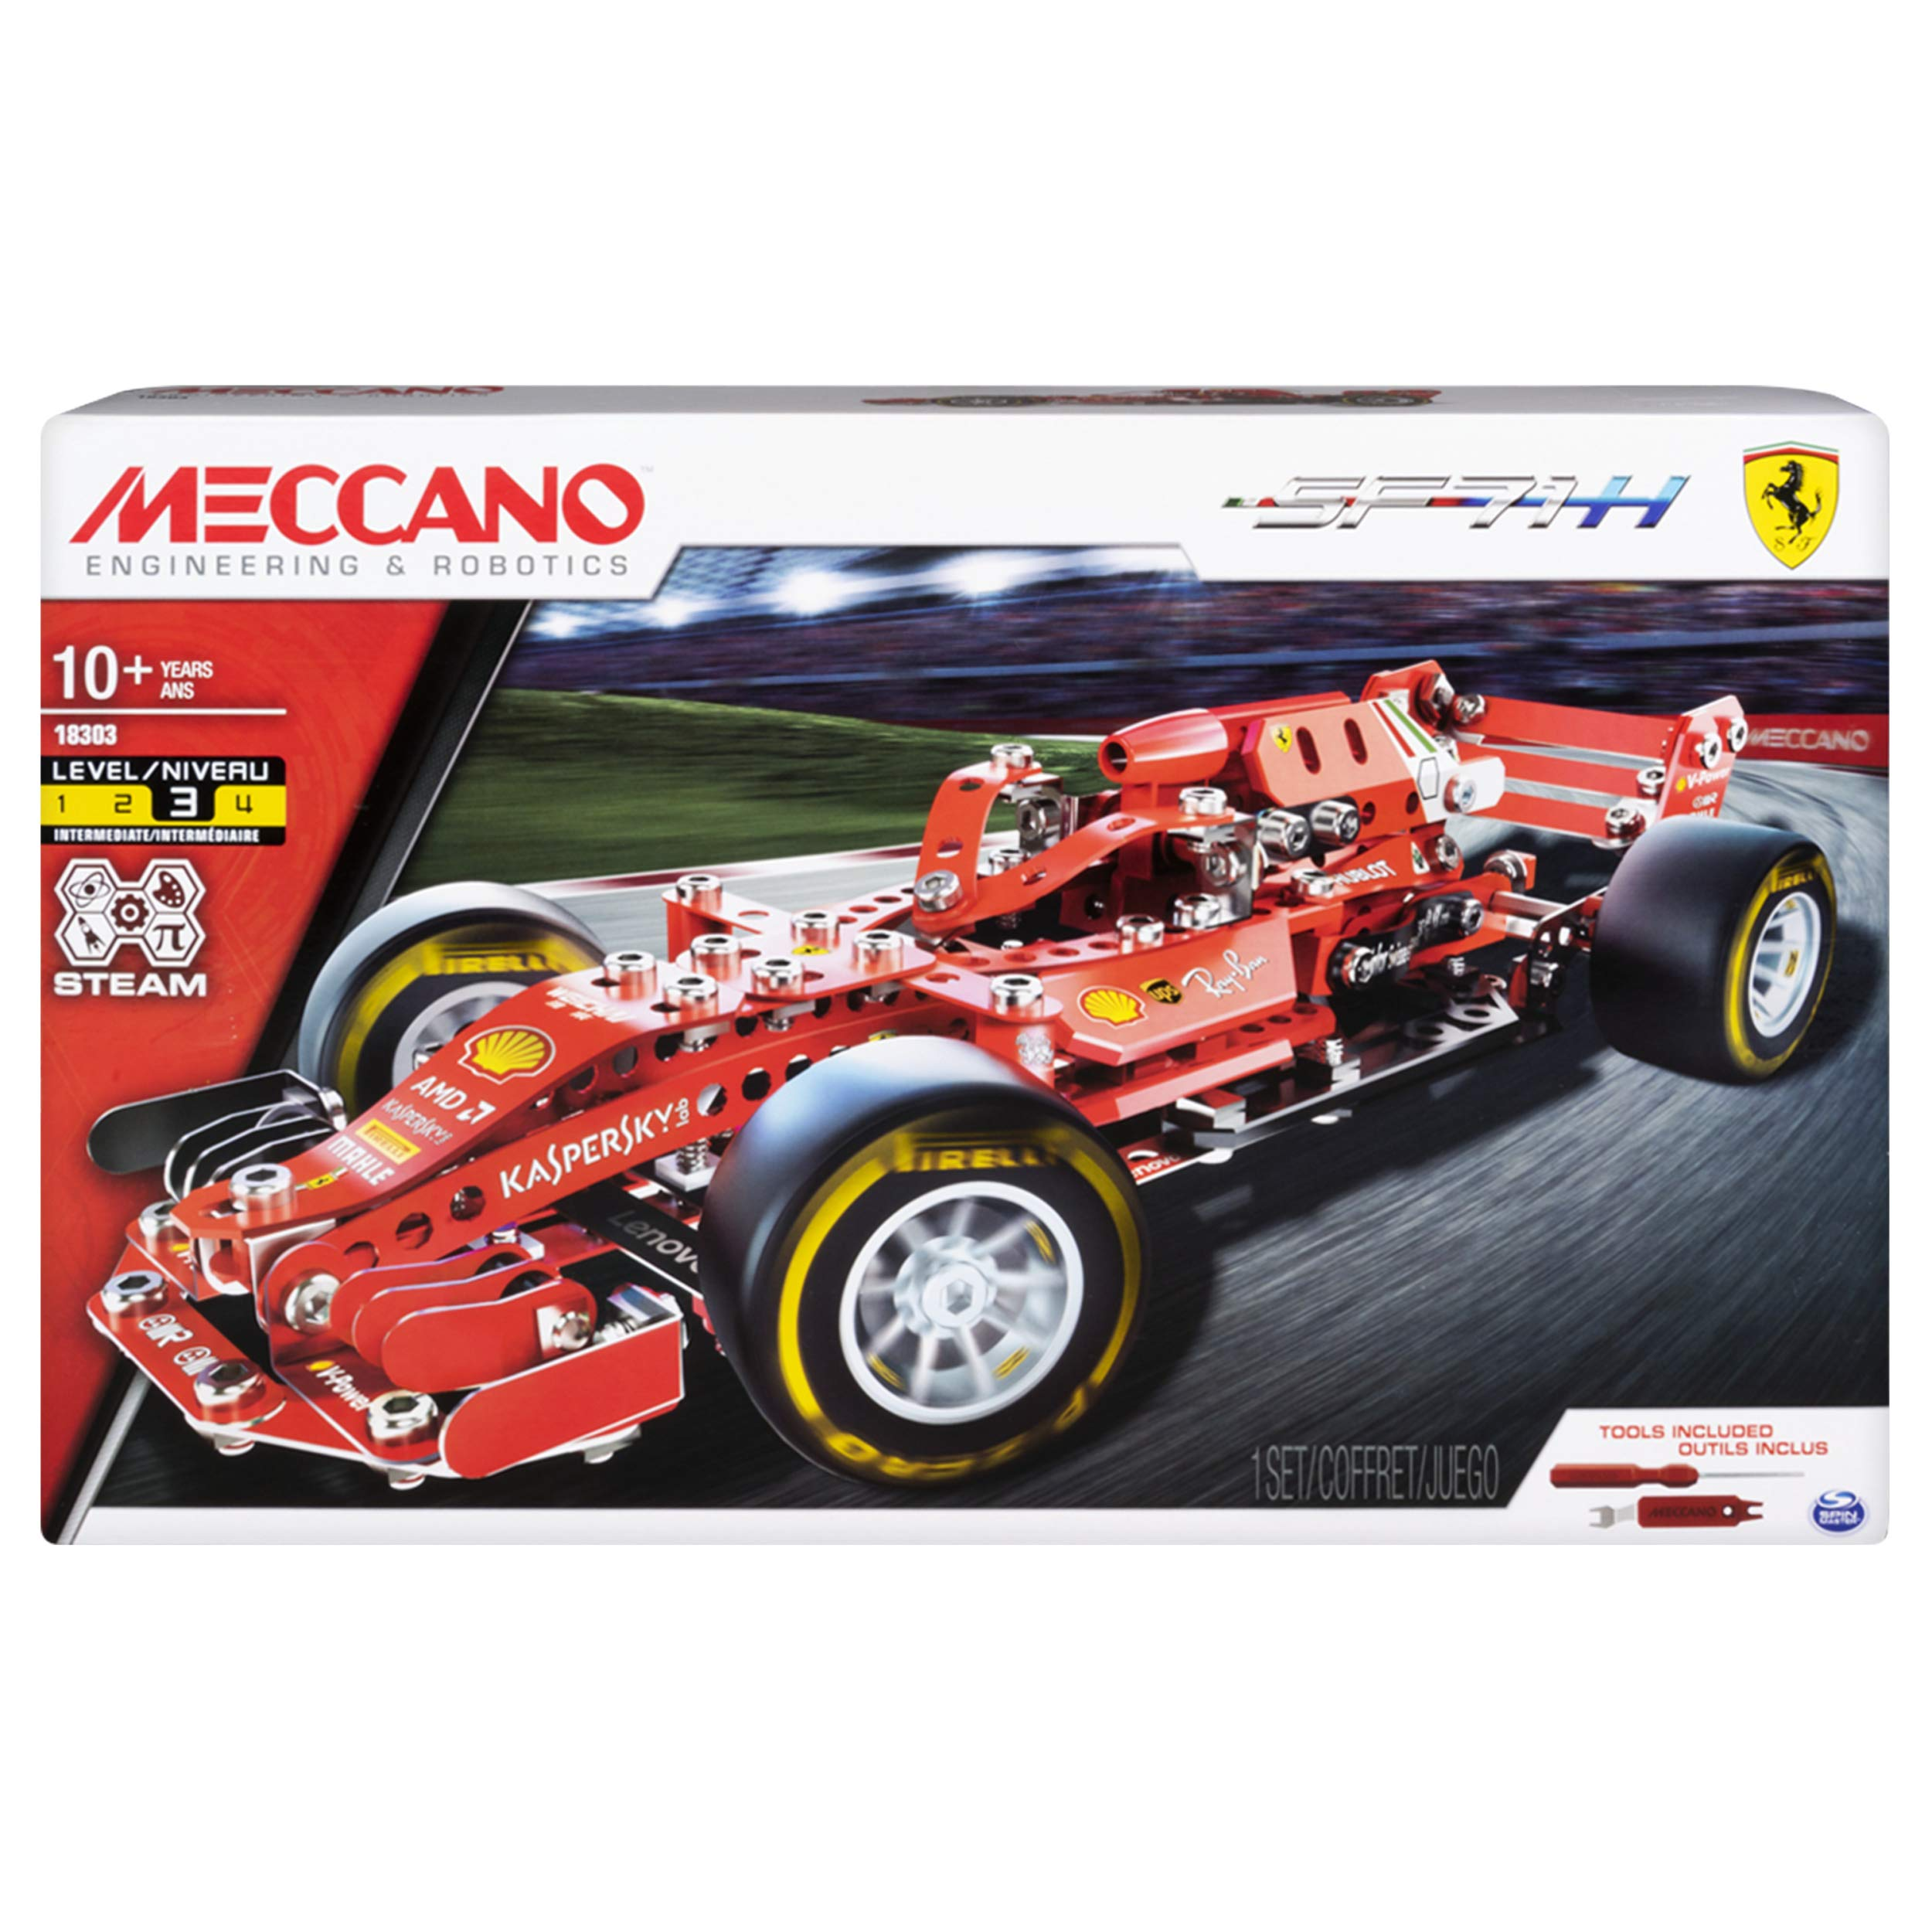 /25/Supercar Constructions Meccano/ Multicoloured Bizak, S.A. 61929176